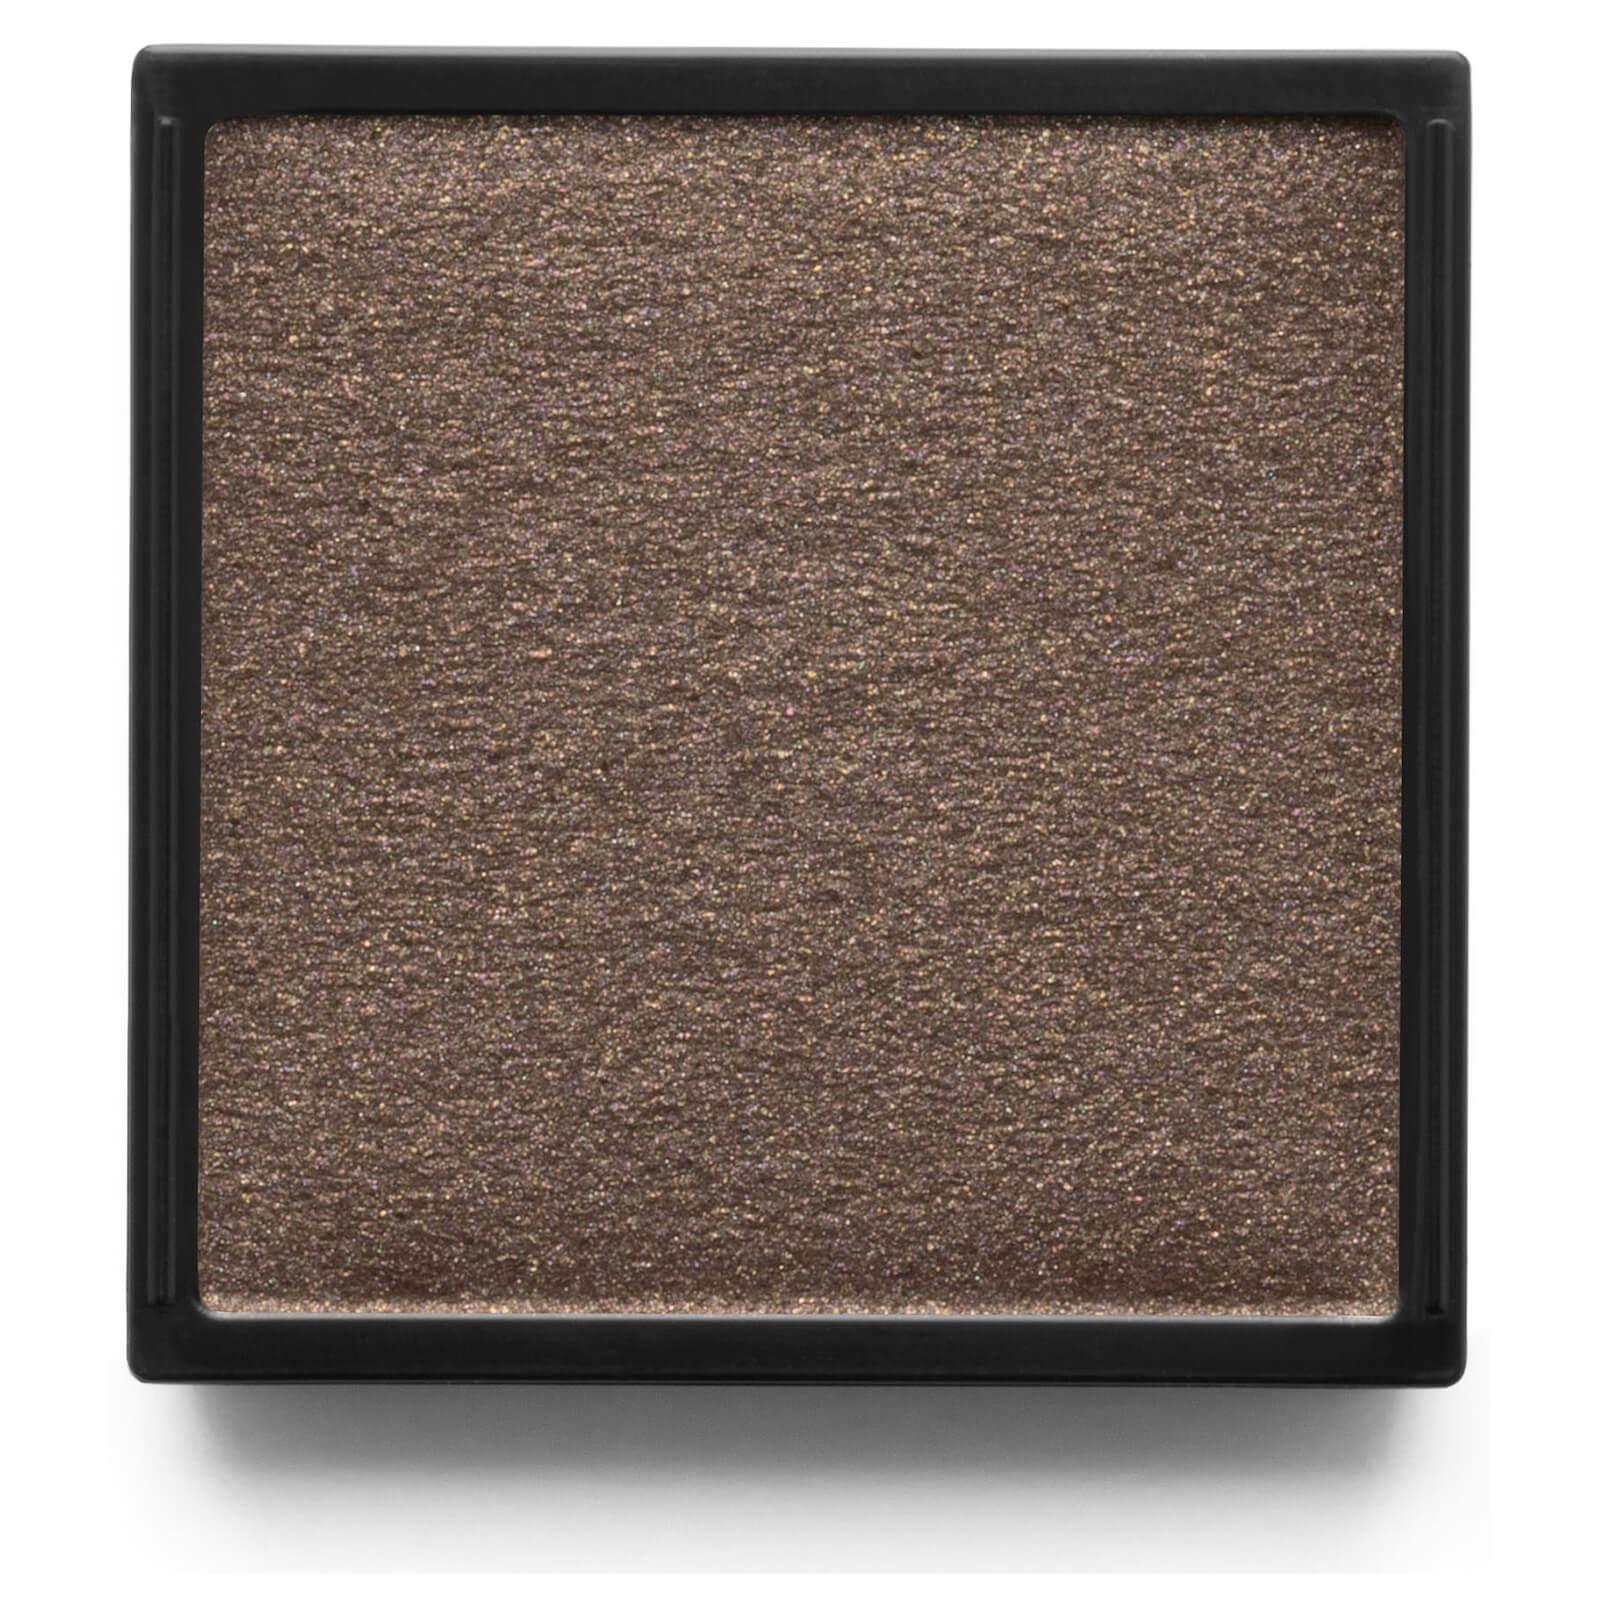 Surratt Artistique Eyeshadow 1.7g (Various Shades) - Chocolat Noir